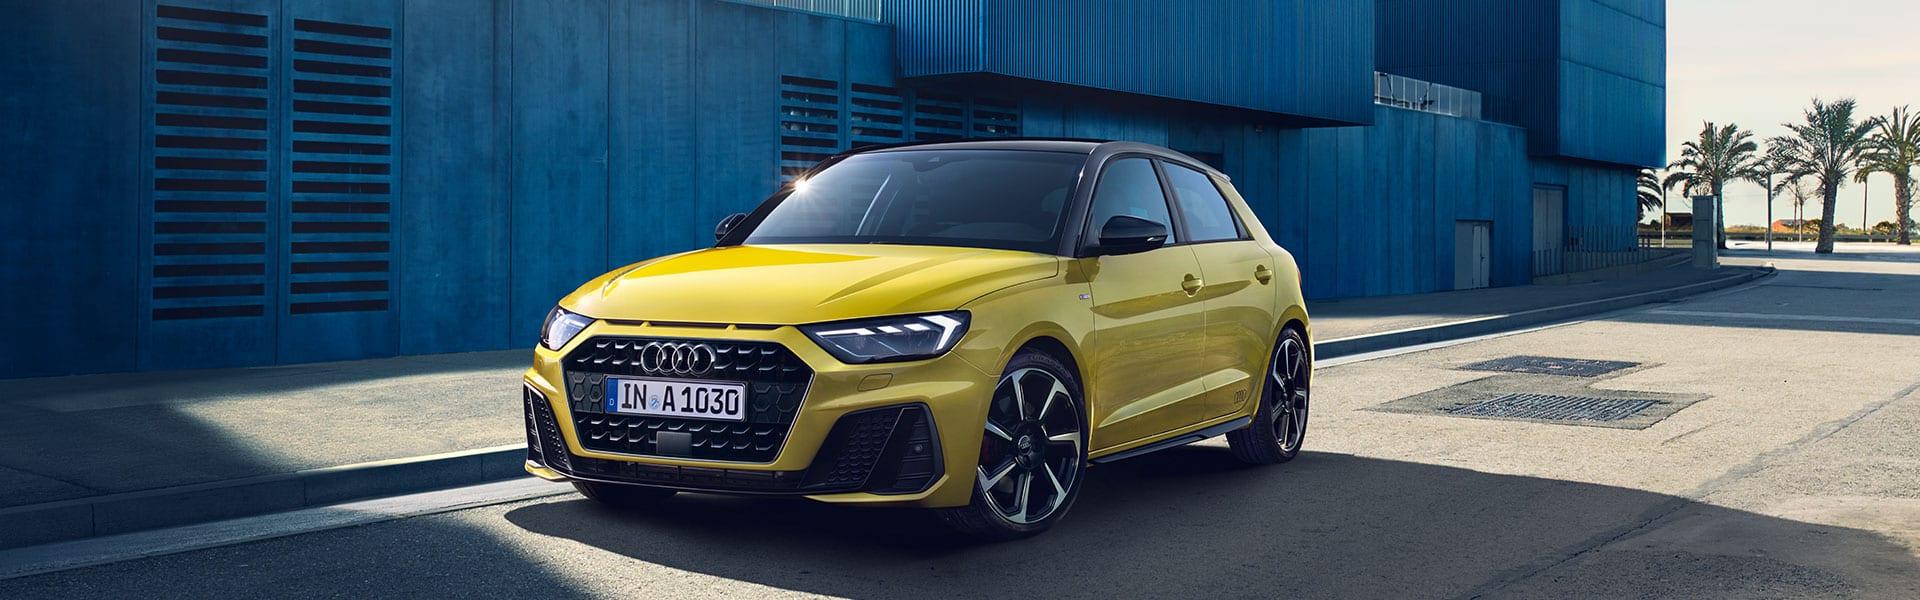 Audi A1 aparcado